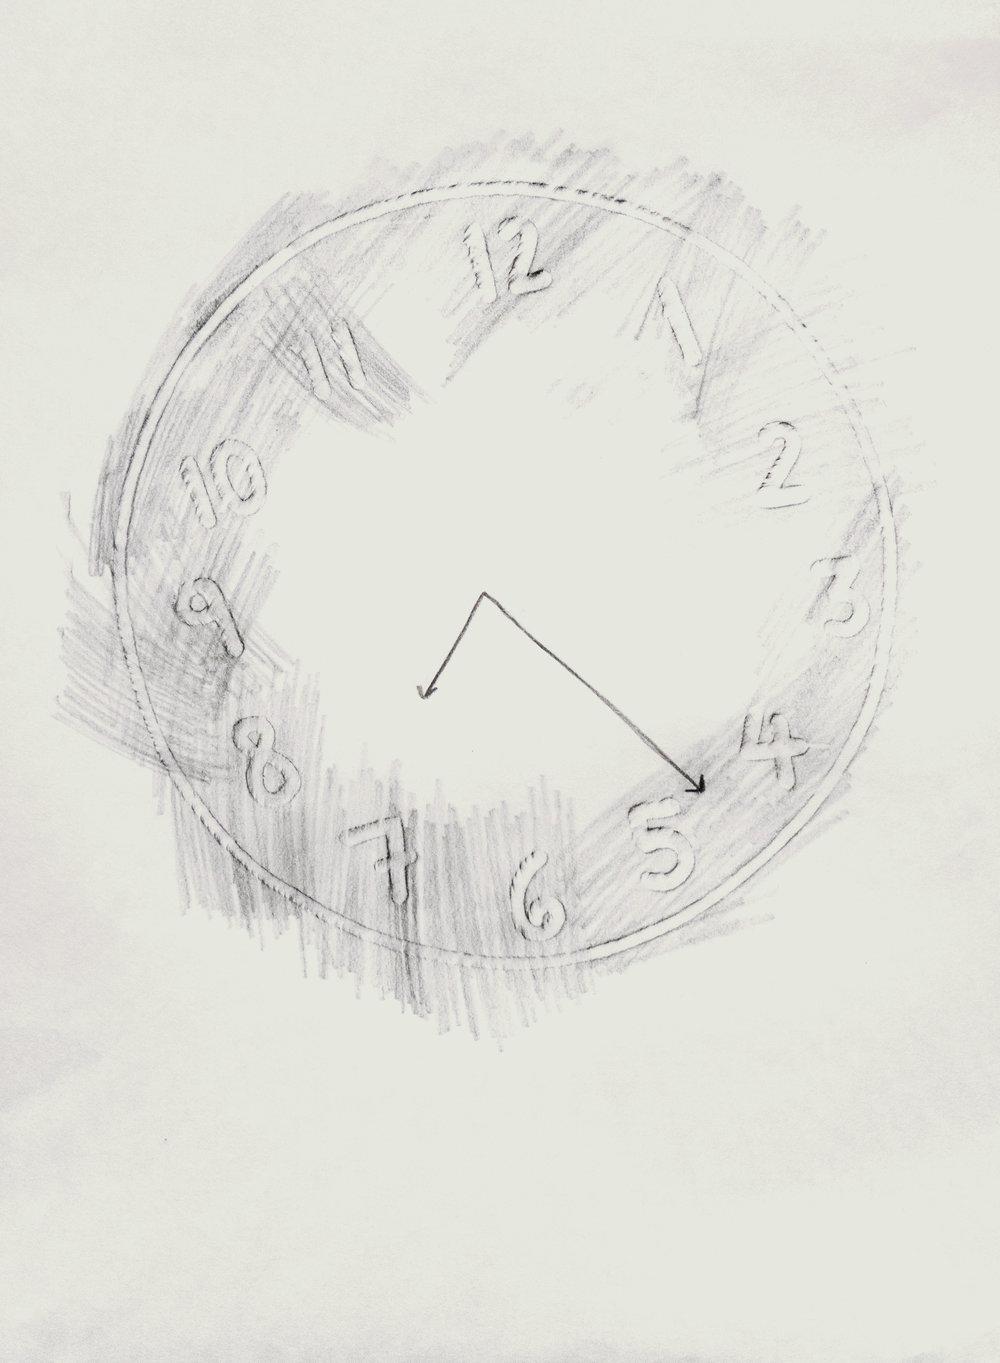 clock_rubbings_0017_Layer 2.jpg